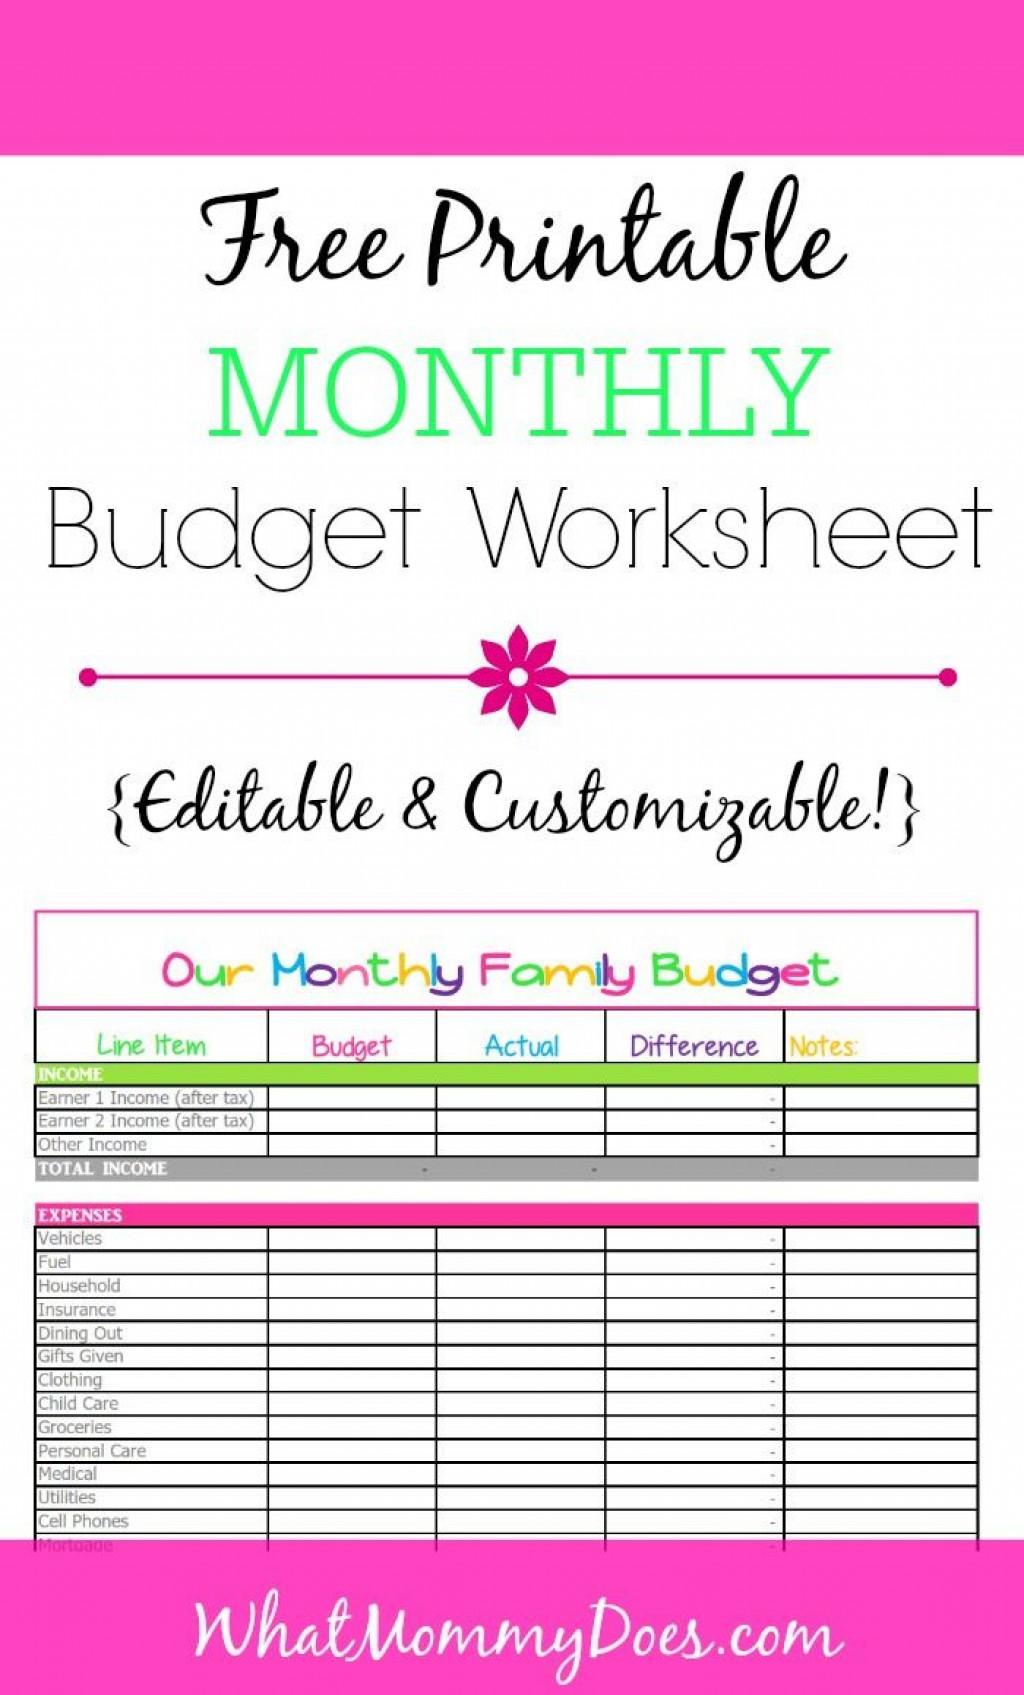 008 Fascinating Free Monthly Budget Template Printable Design  Simple Worksheet Household Planner UkLarge